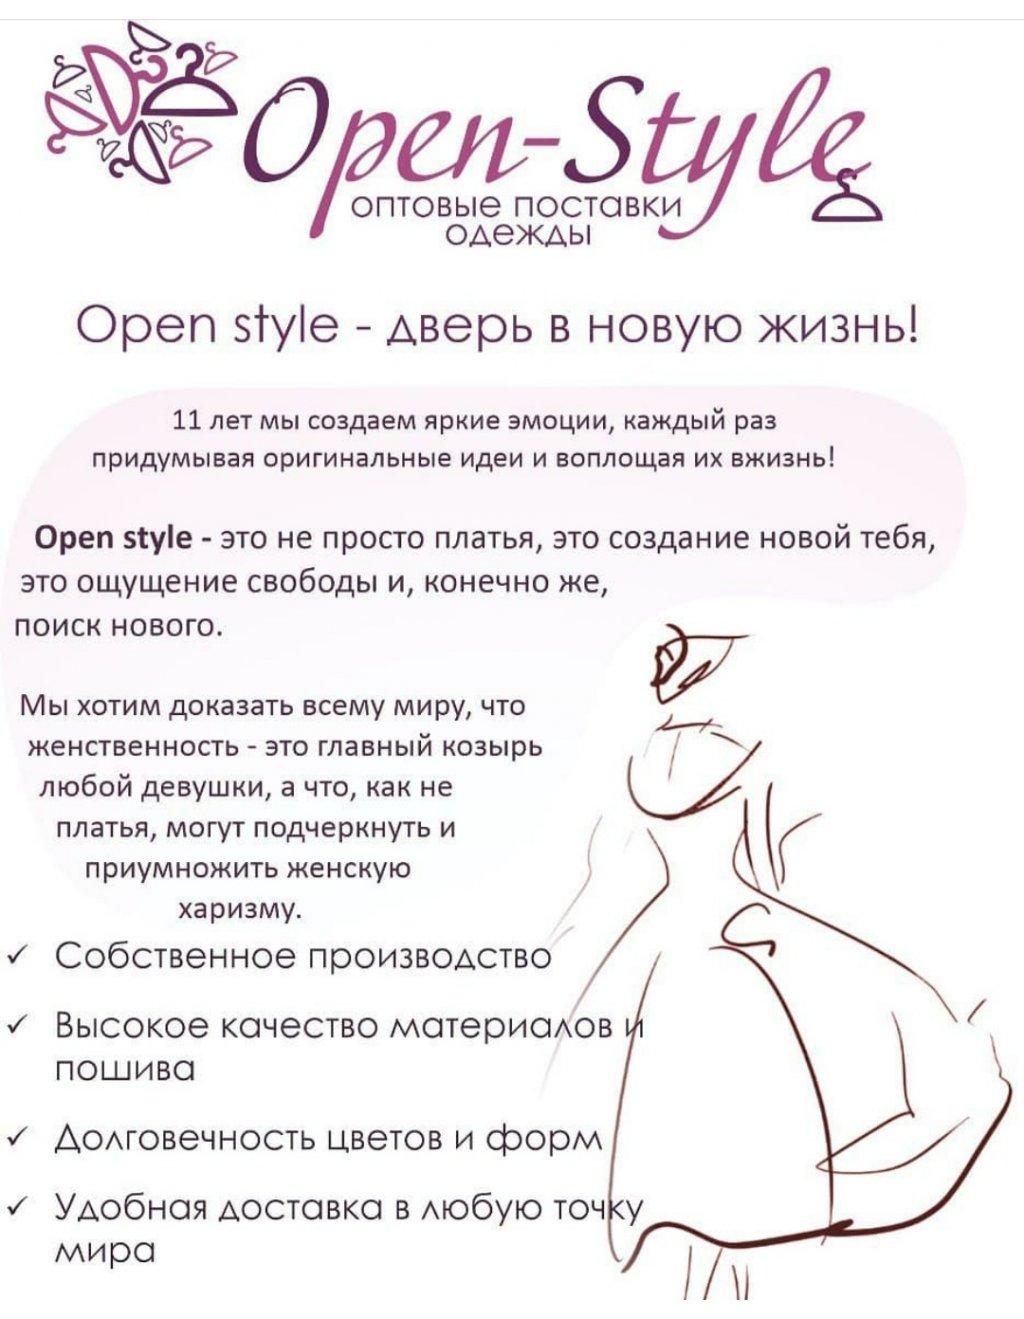 Интернет магазин Оpen-style